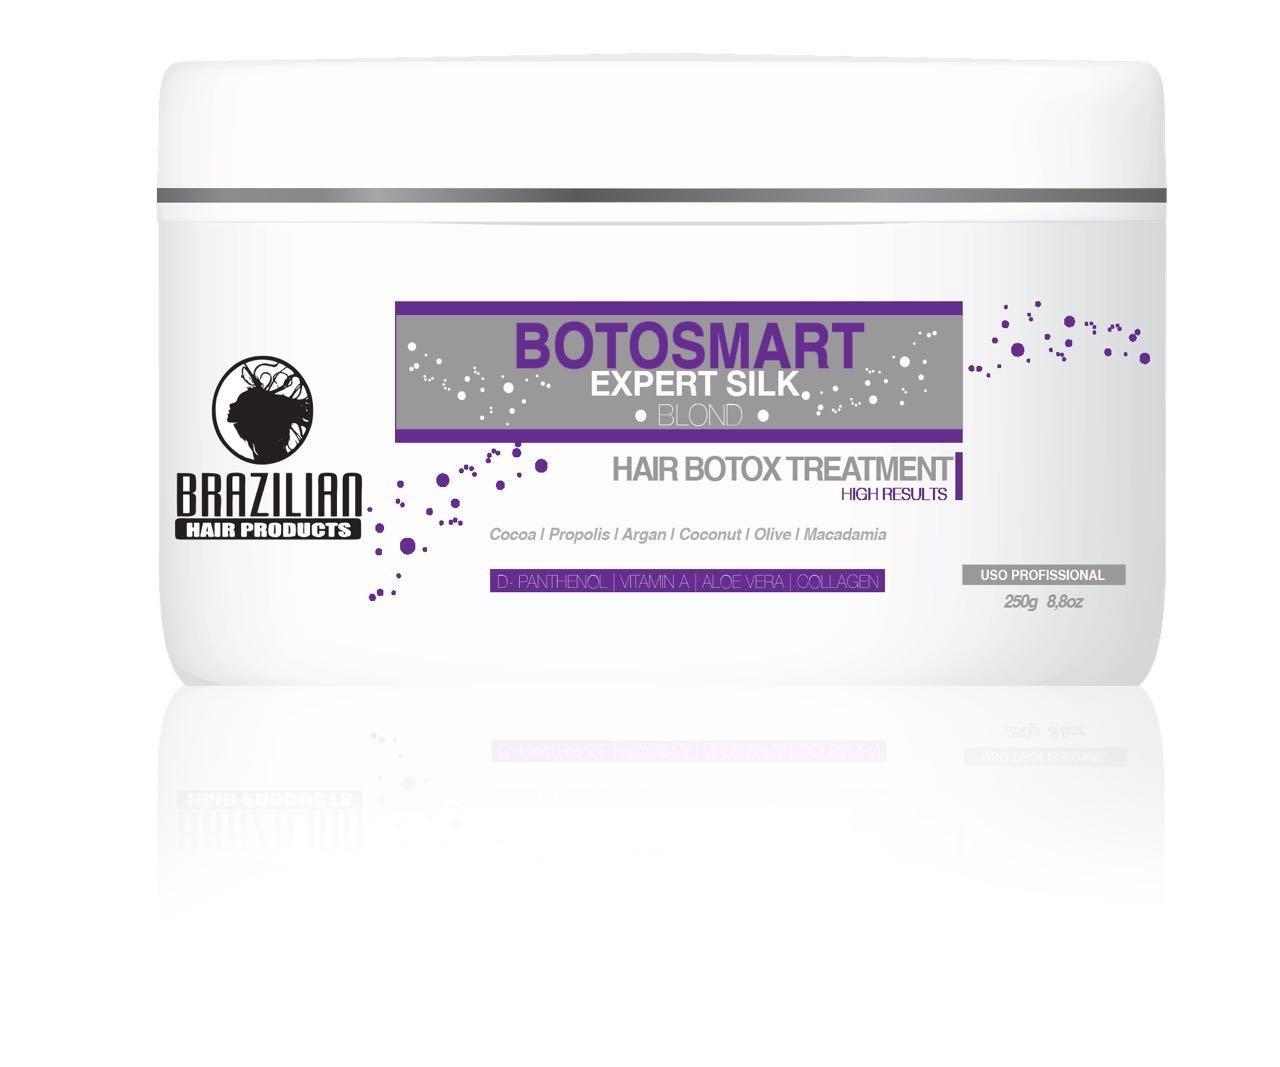 Brazilian BotoSmart Expert Silk Blond Hair with Macadamia 250 Milliliter brazilianhairproducts